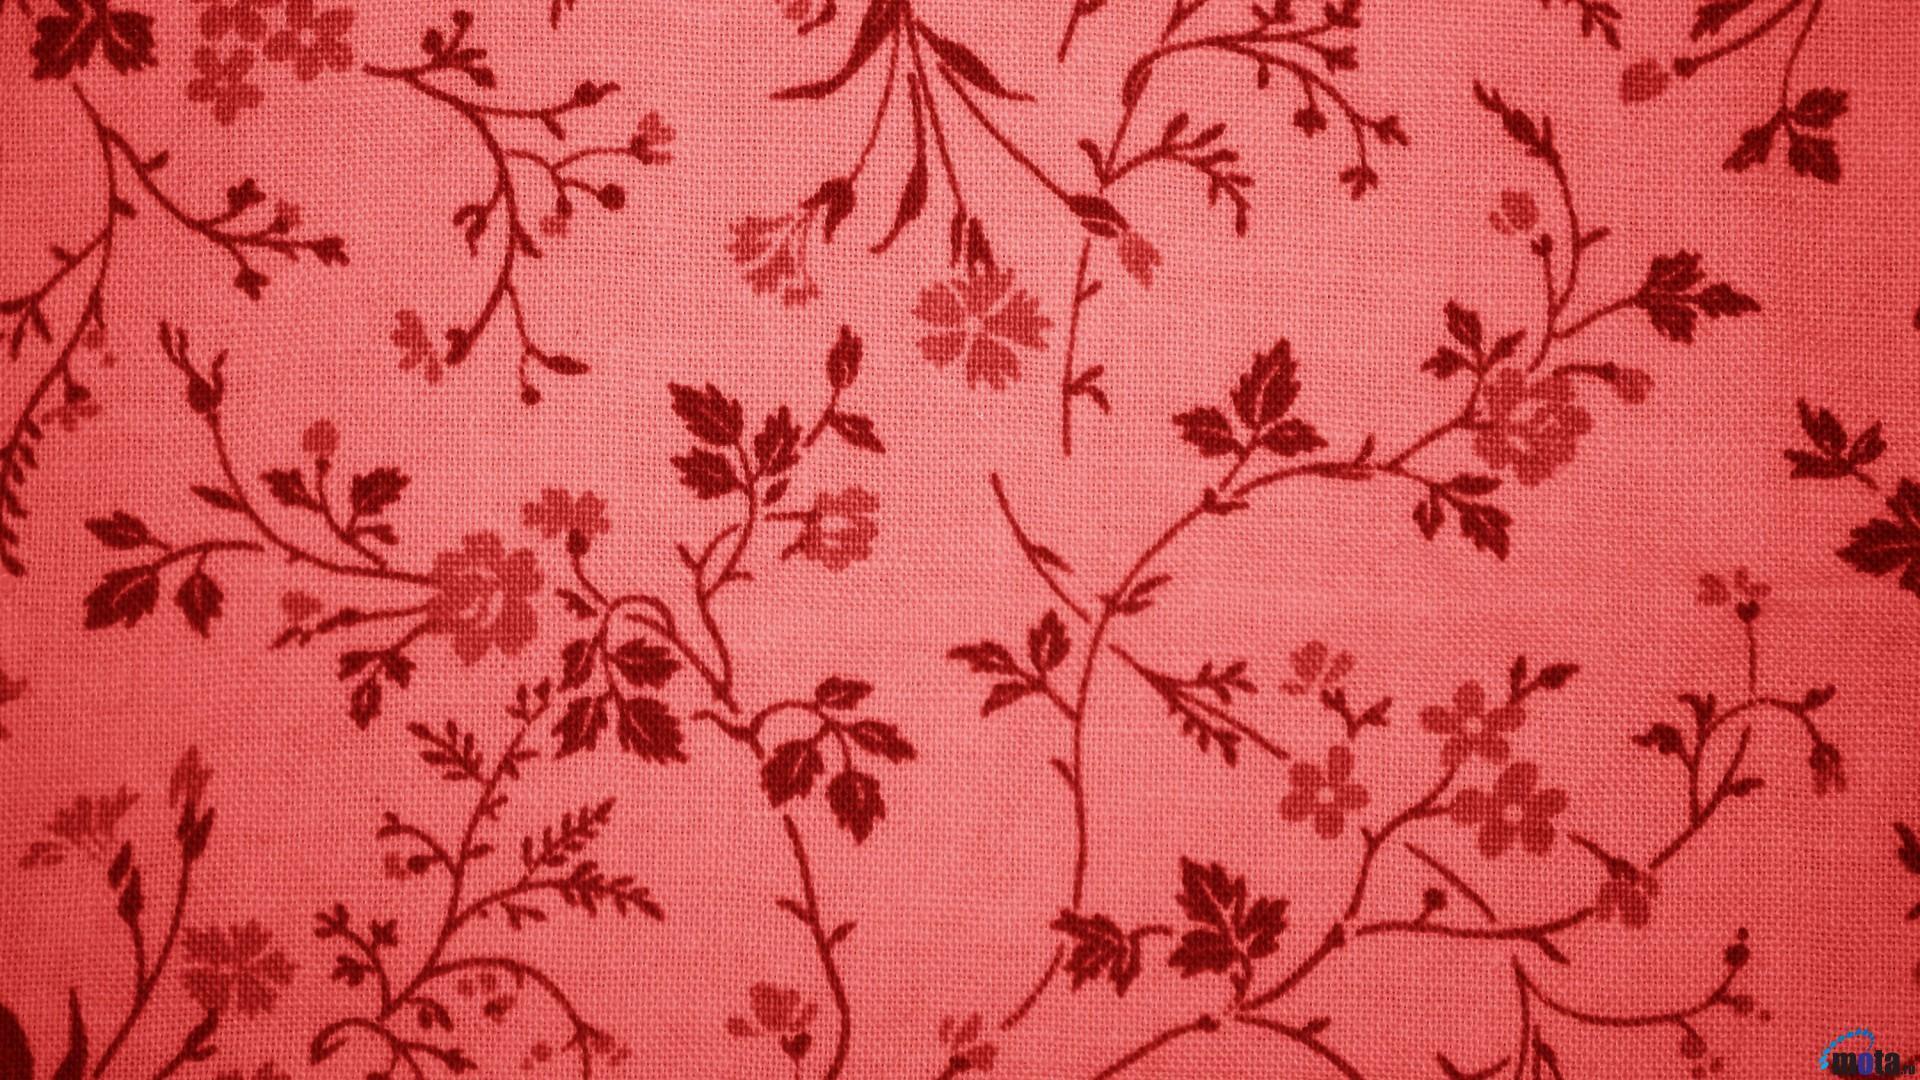 Design Vinyl Wallpaper With Floral Design By Mura Vinyl Vintage